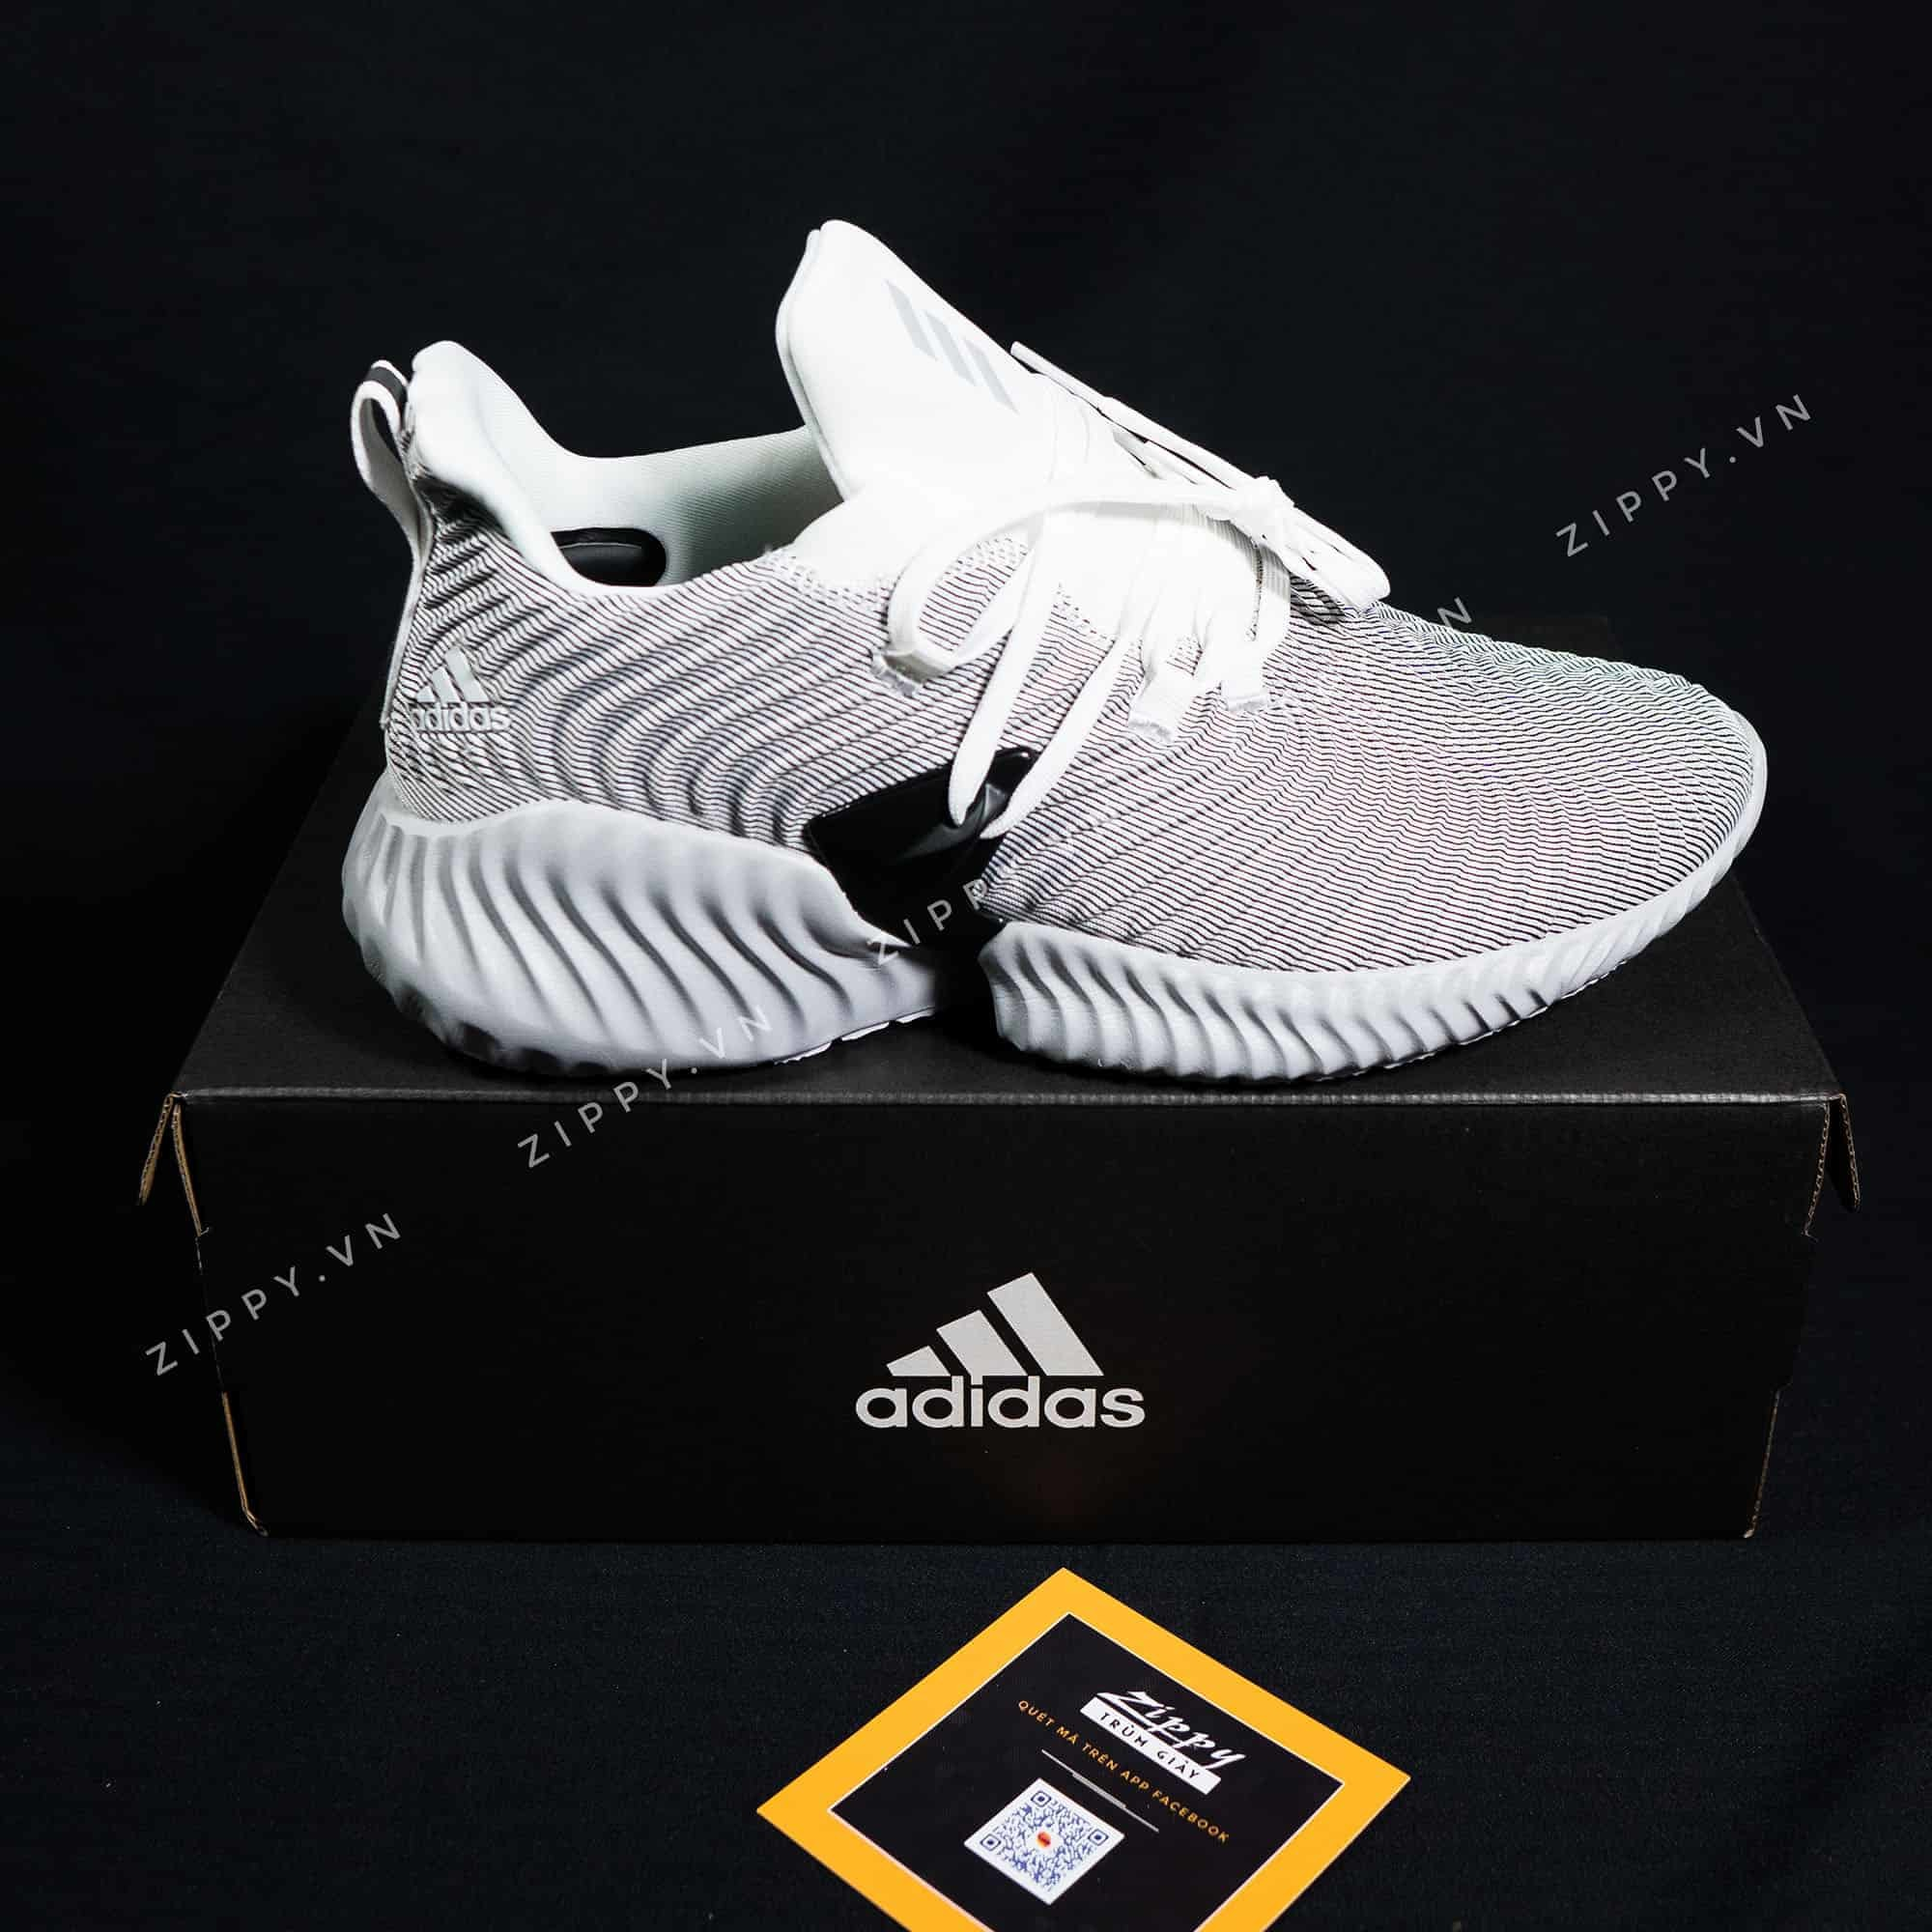 wholesale dealer ec319 9f52a Adidas Alphabounce Instinct Màu Xám Nhạt